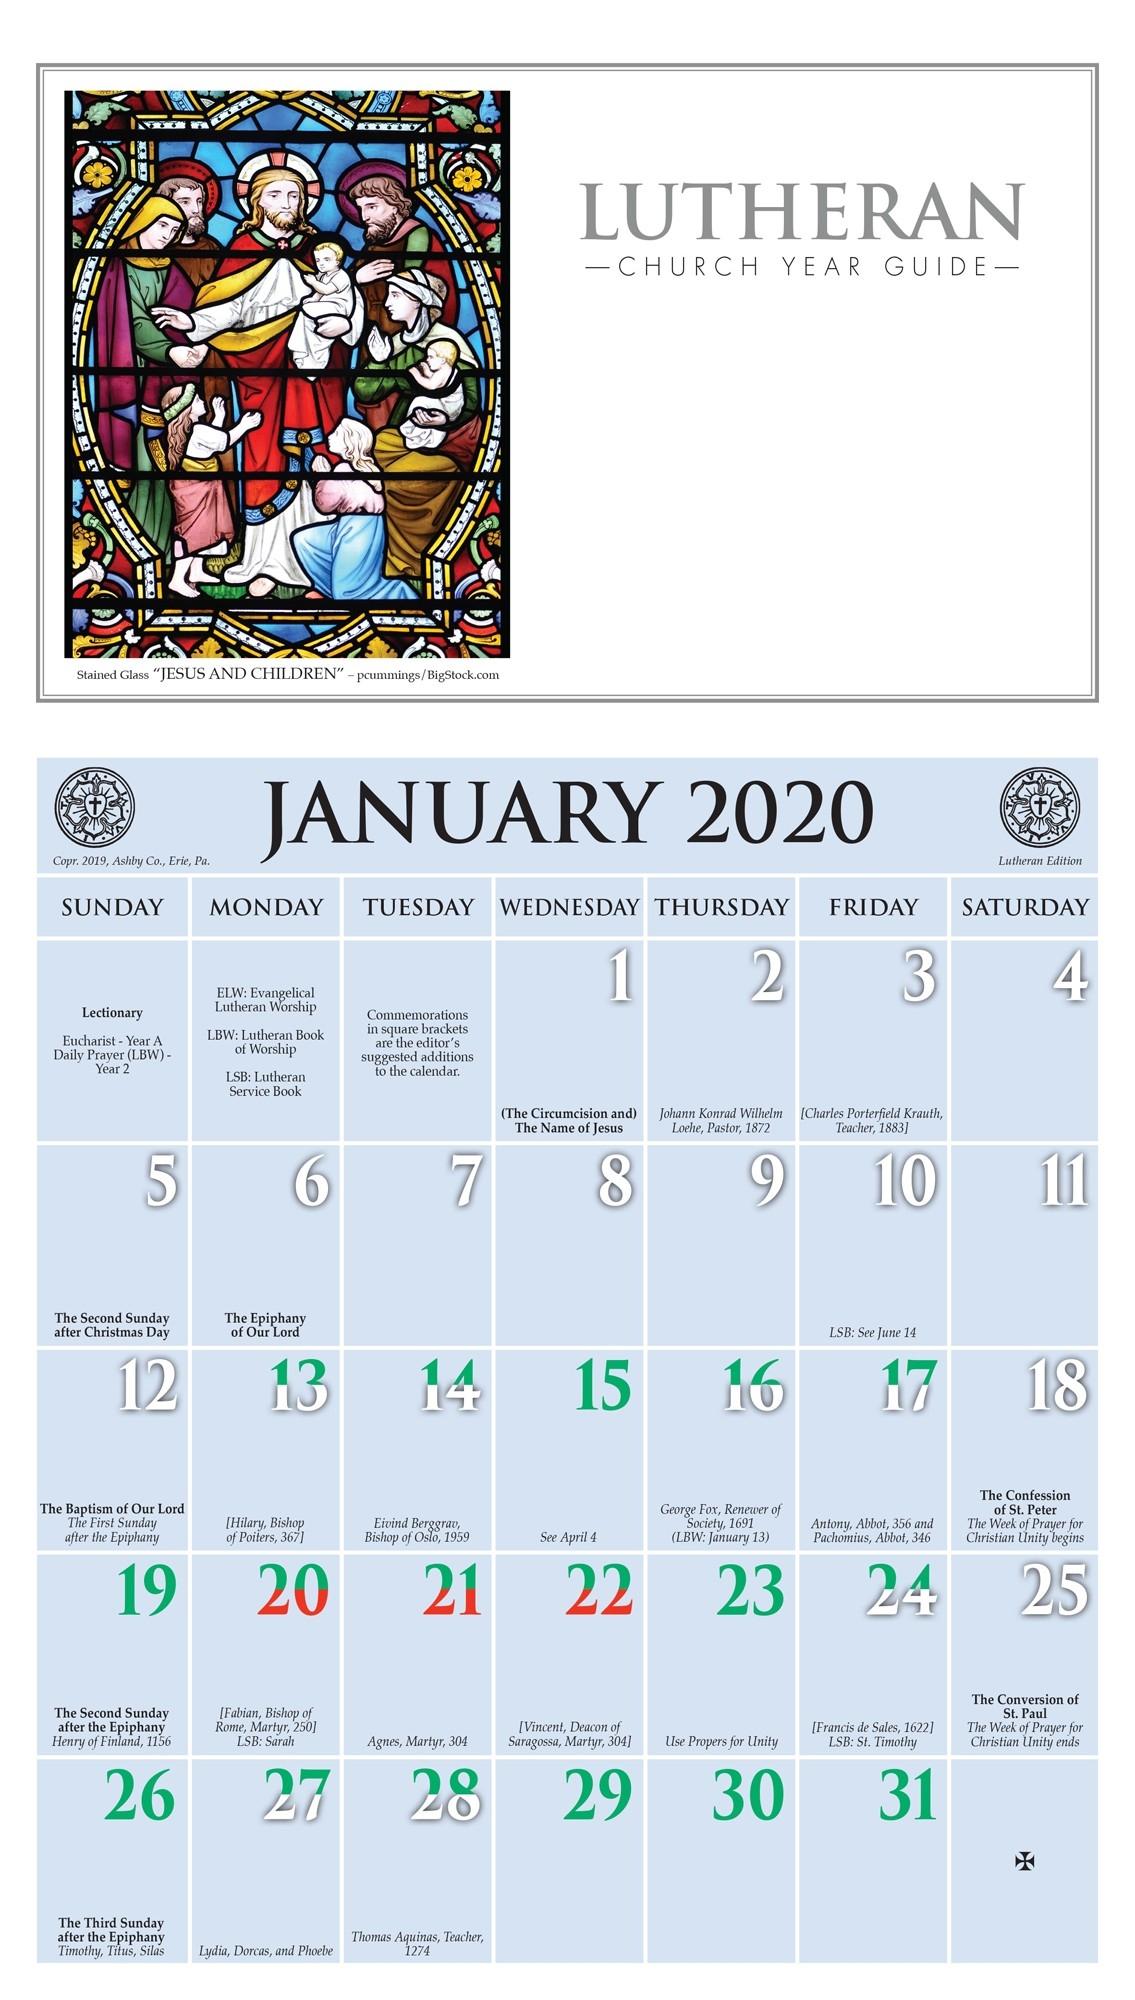 2020 Church Year Calendar  Revised Common Lectionary 2020 Calendar